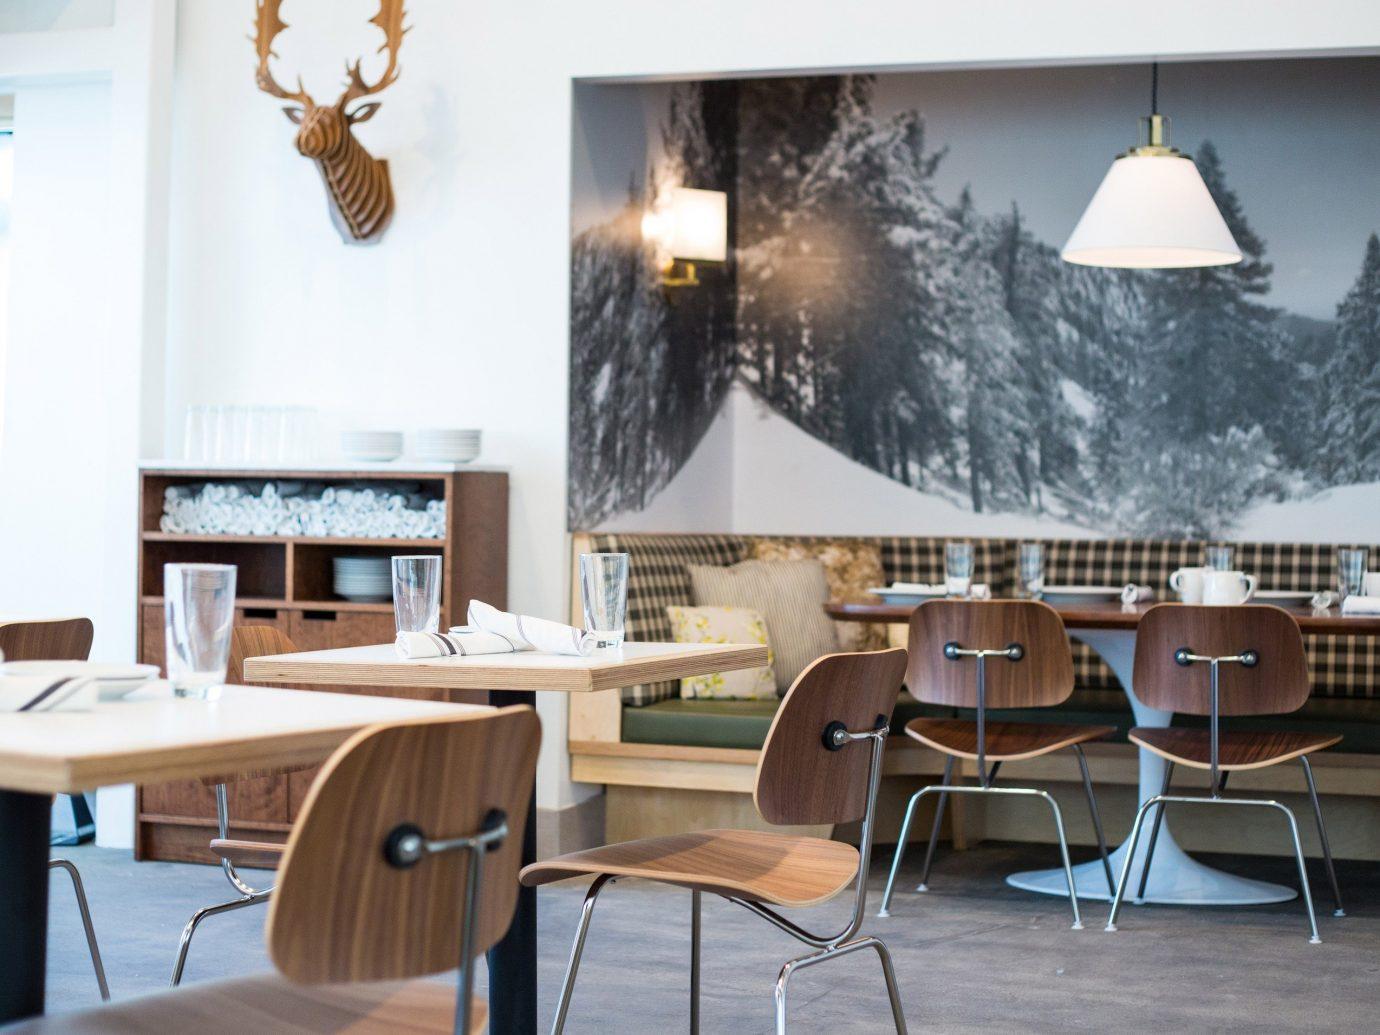 Food + Drink floor chair indoor dining room room property interior design home restaurant Design living room area furniture